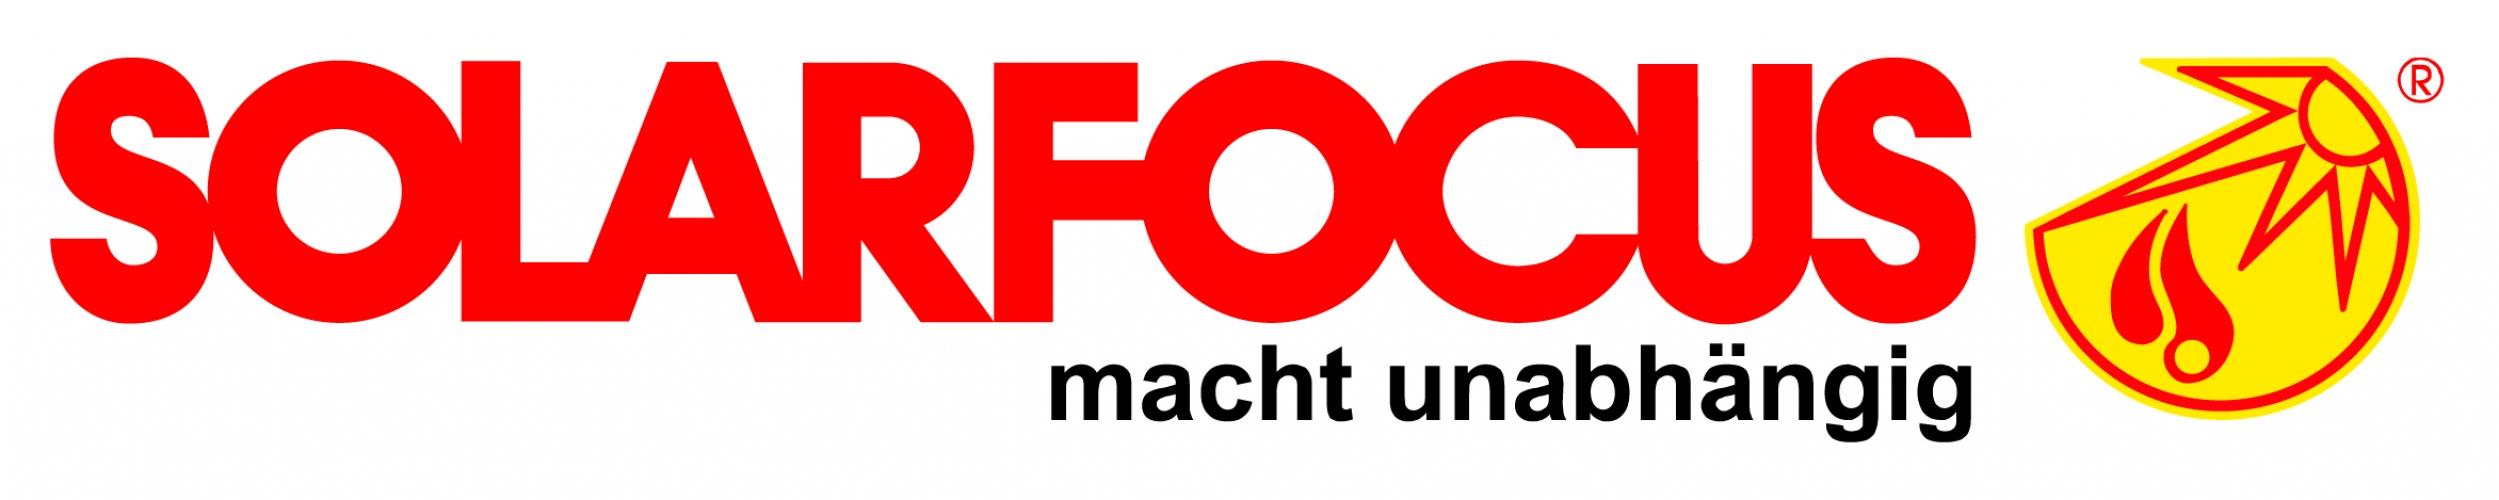 setheight500-logo-0106-solarfocus-konvertiert